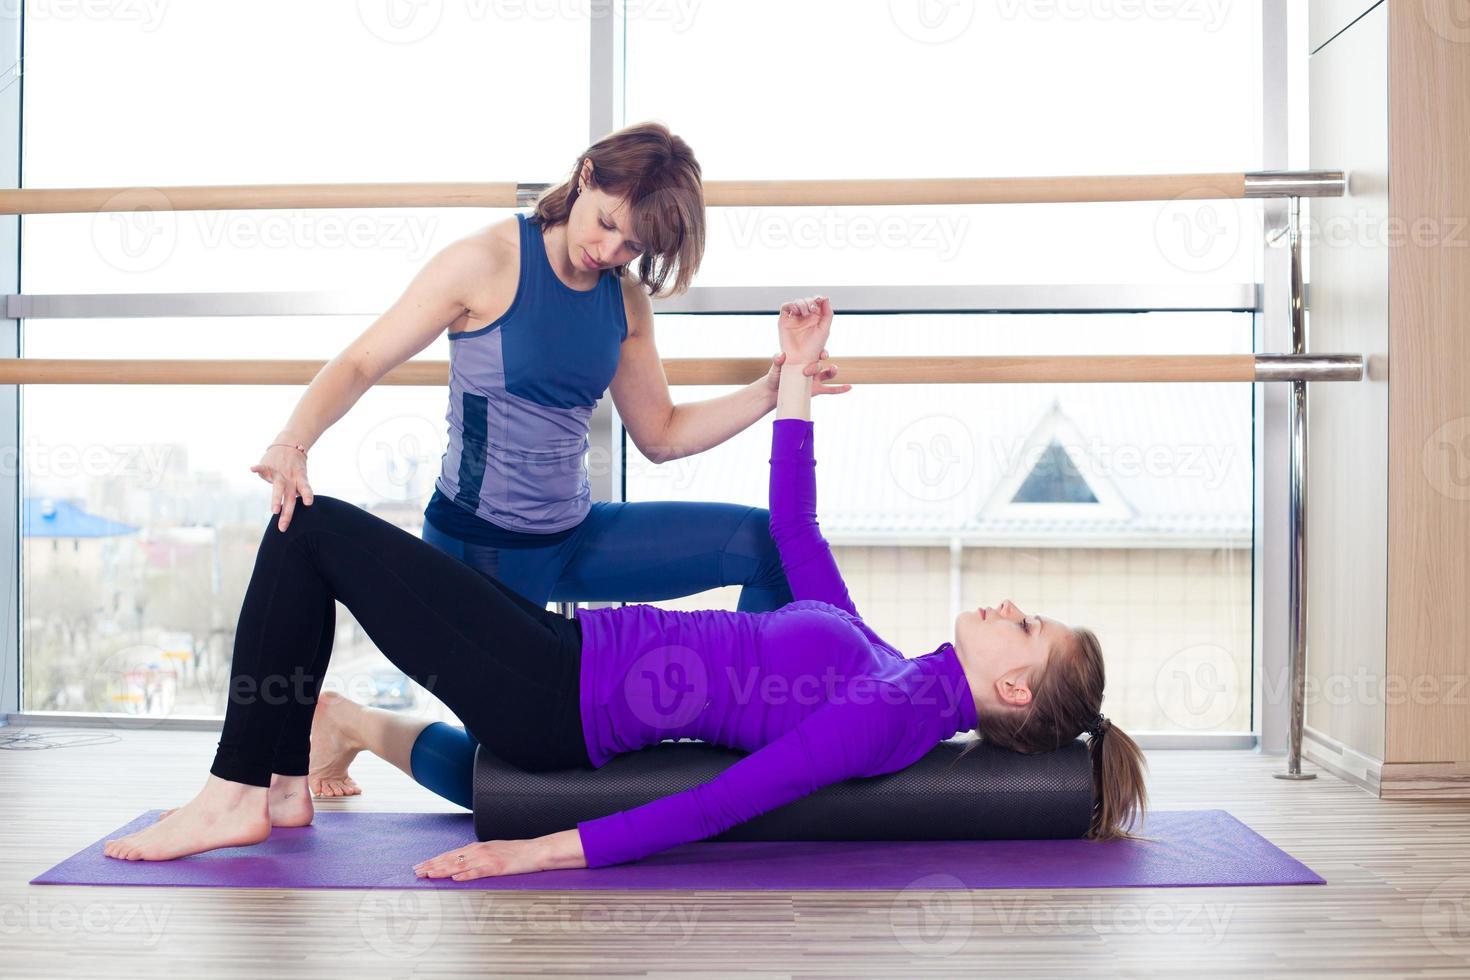 aerobics pilates personal trainer helpt vrouwengroep in een sportschool foto